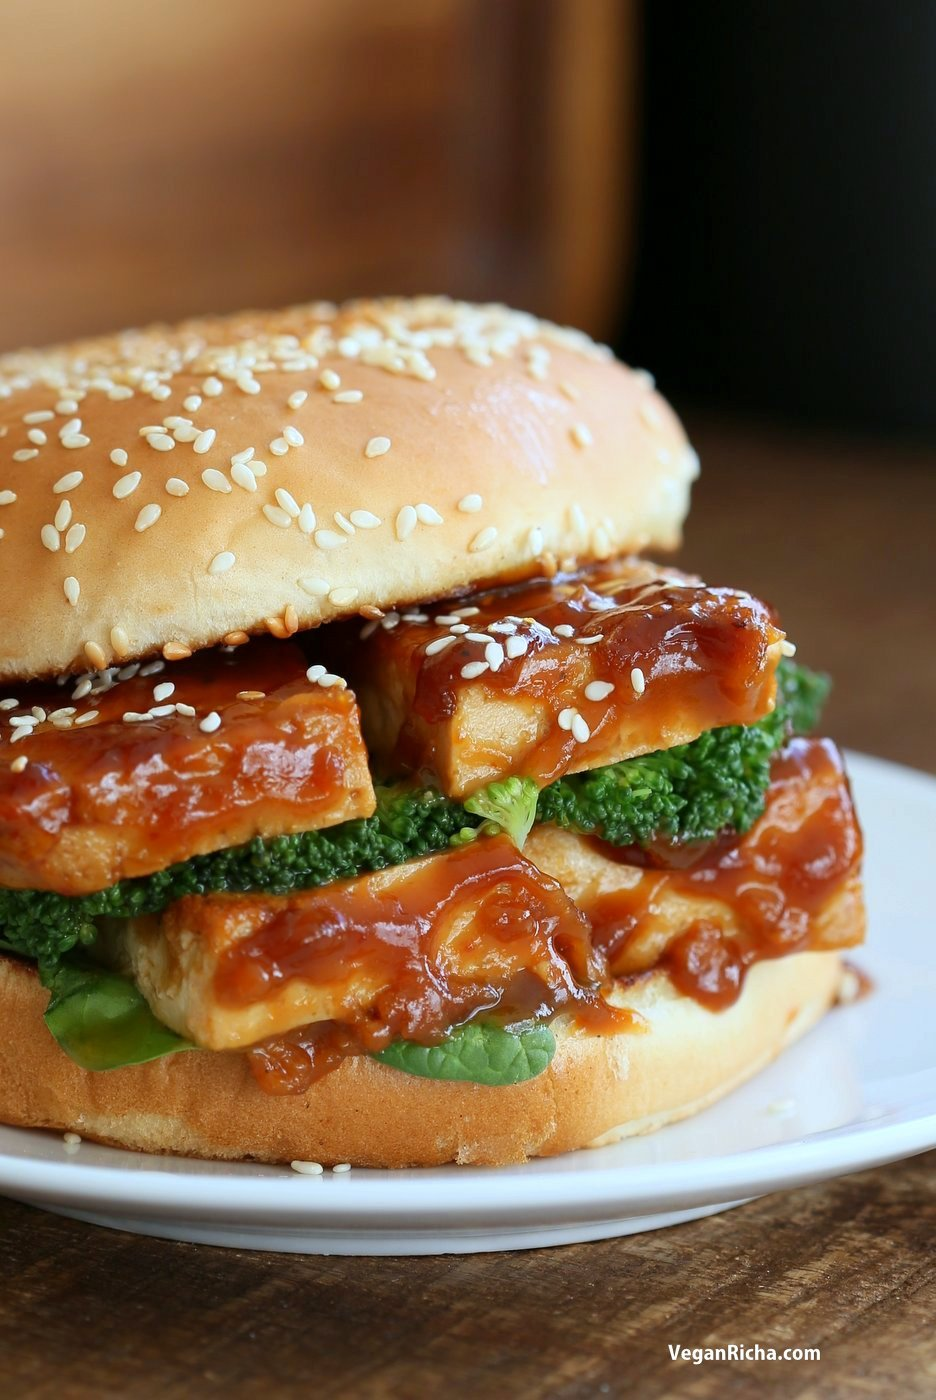 General Tso's Tofu Sandwich. Vegan General Tso Sauce Recipe. Bake the tofu or pan fry, add blanched veggies and make a sandwich or wrap. Vegan Nut-free Recipe. can be gluten-free with gf buns or wrap.   VeganRicha.com